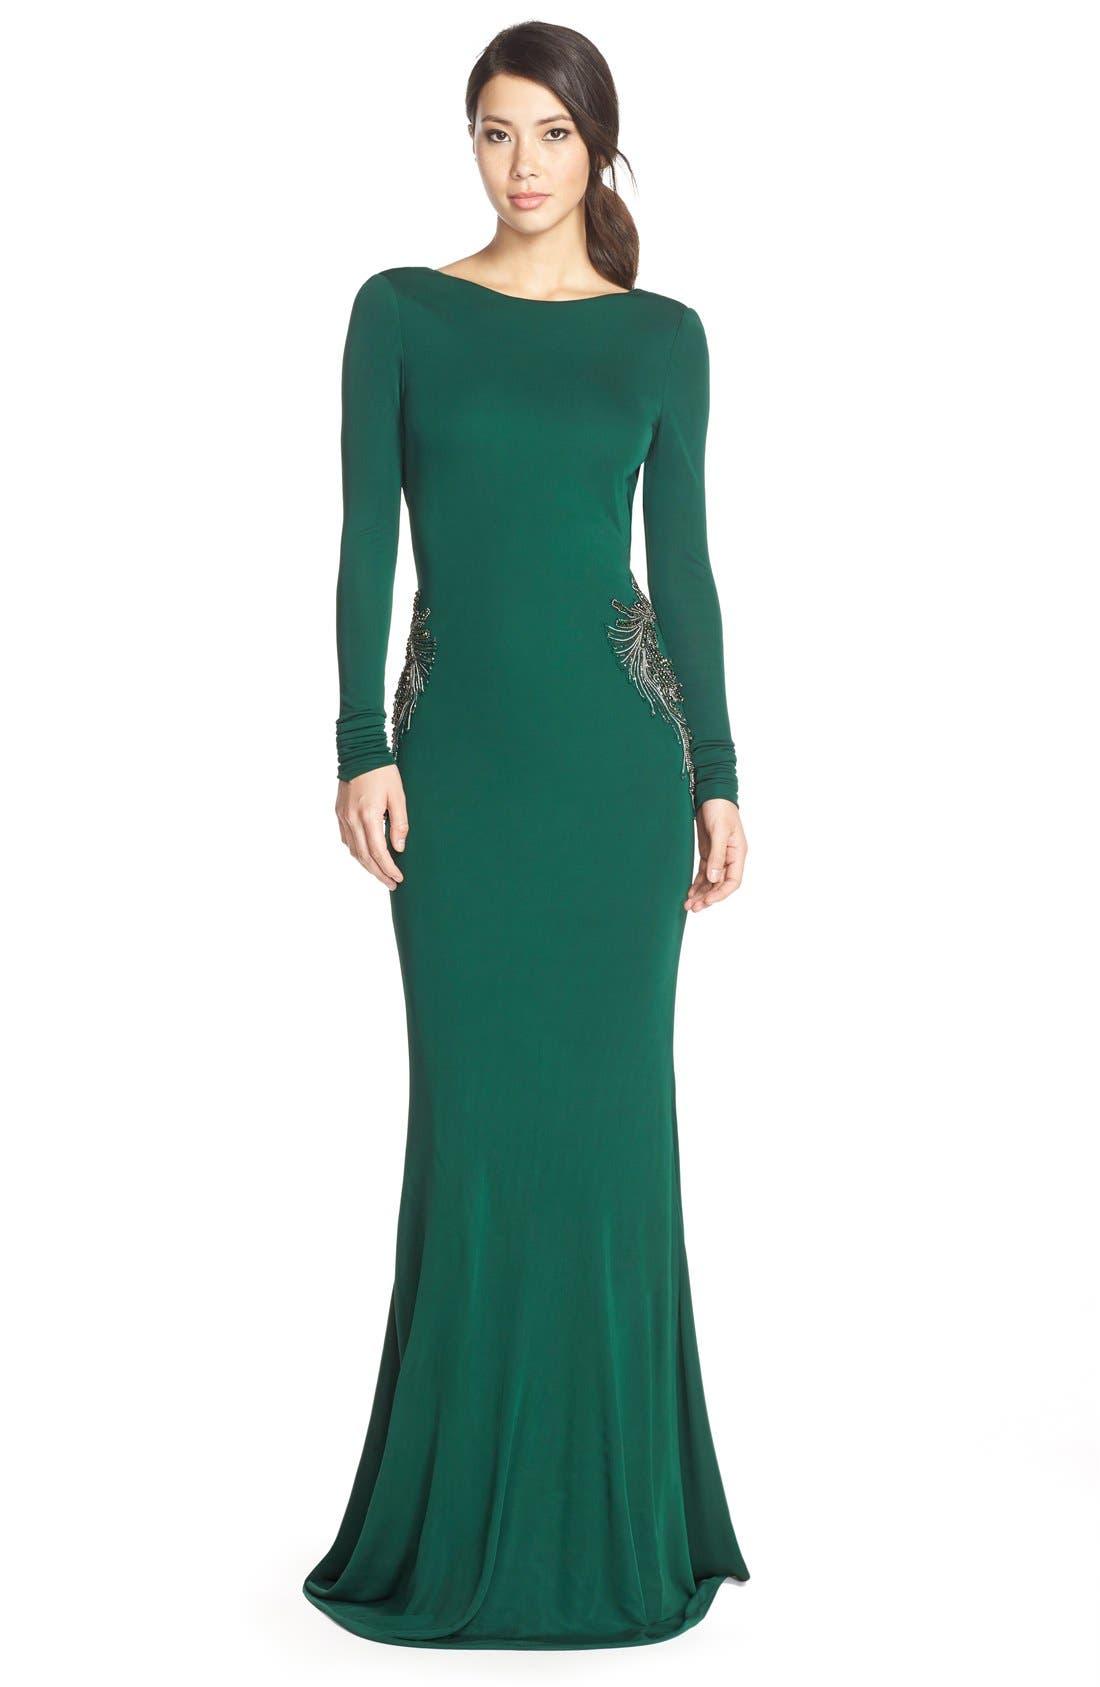 Main Image - Badgley Mischka Beaded Jersey Mermaid Gown